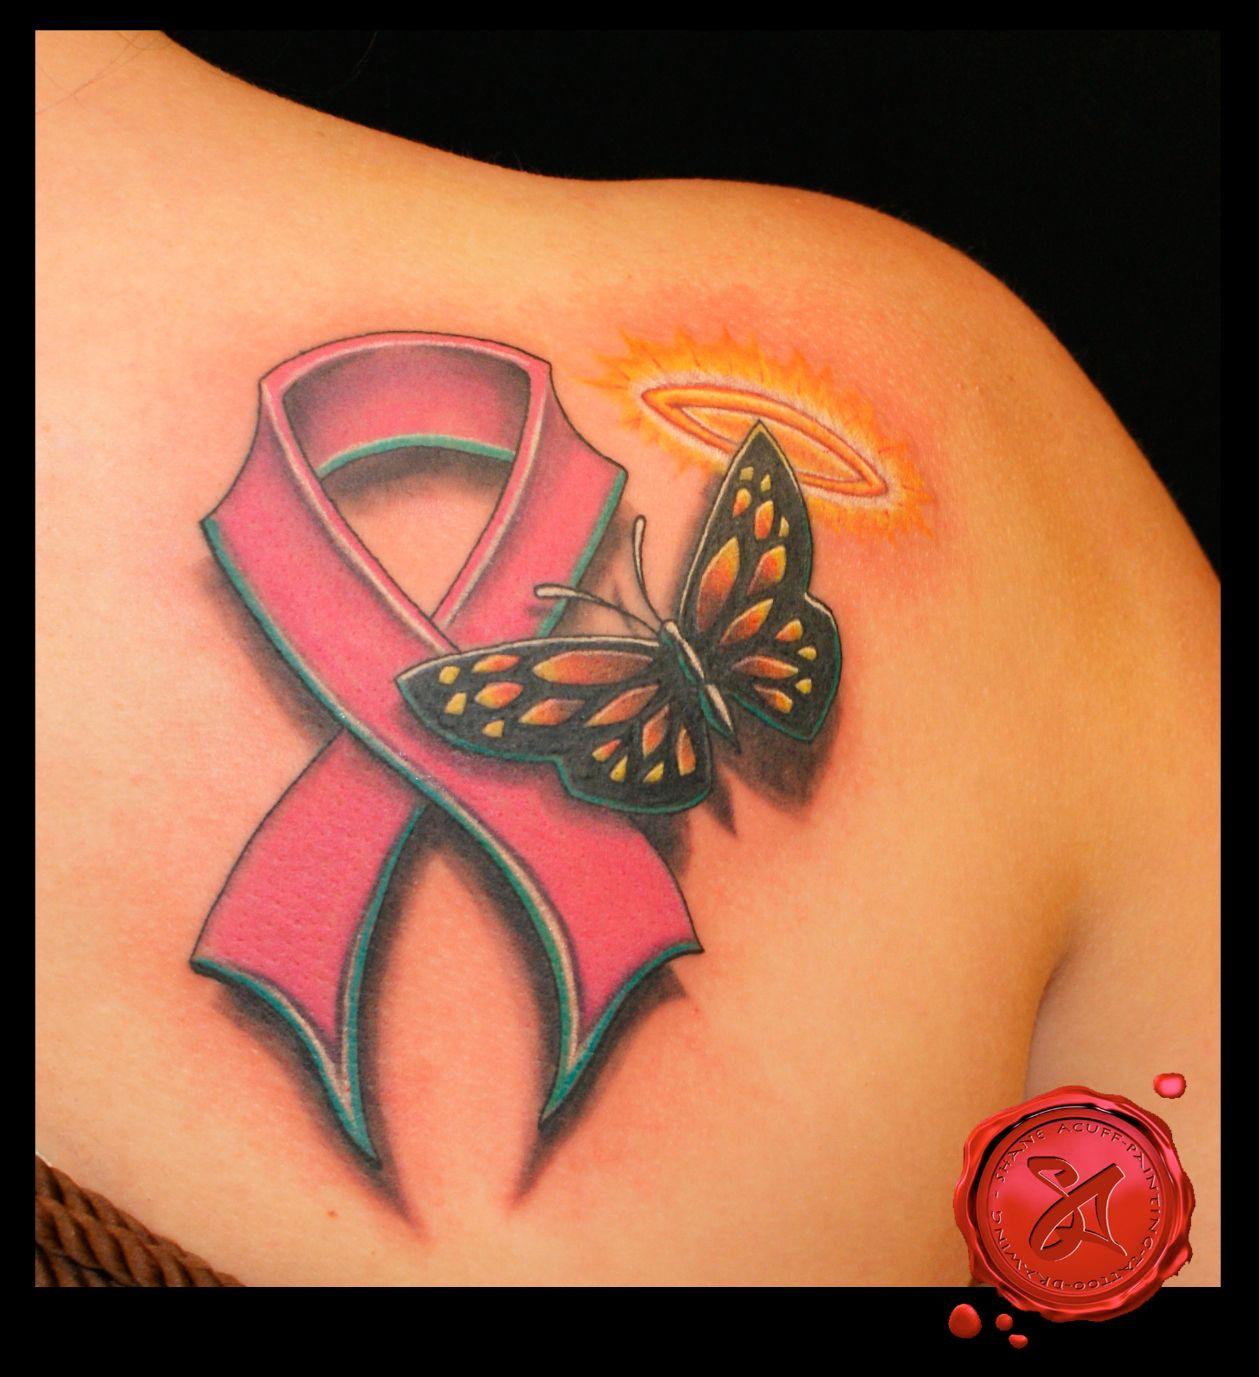 47++ Astonishing Cancer tattoo ideas for mom image HD